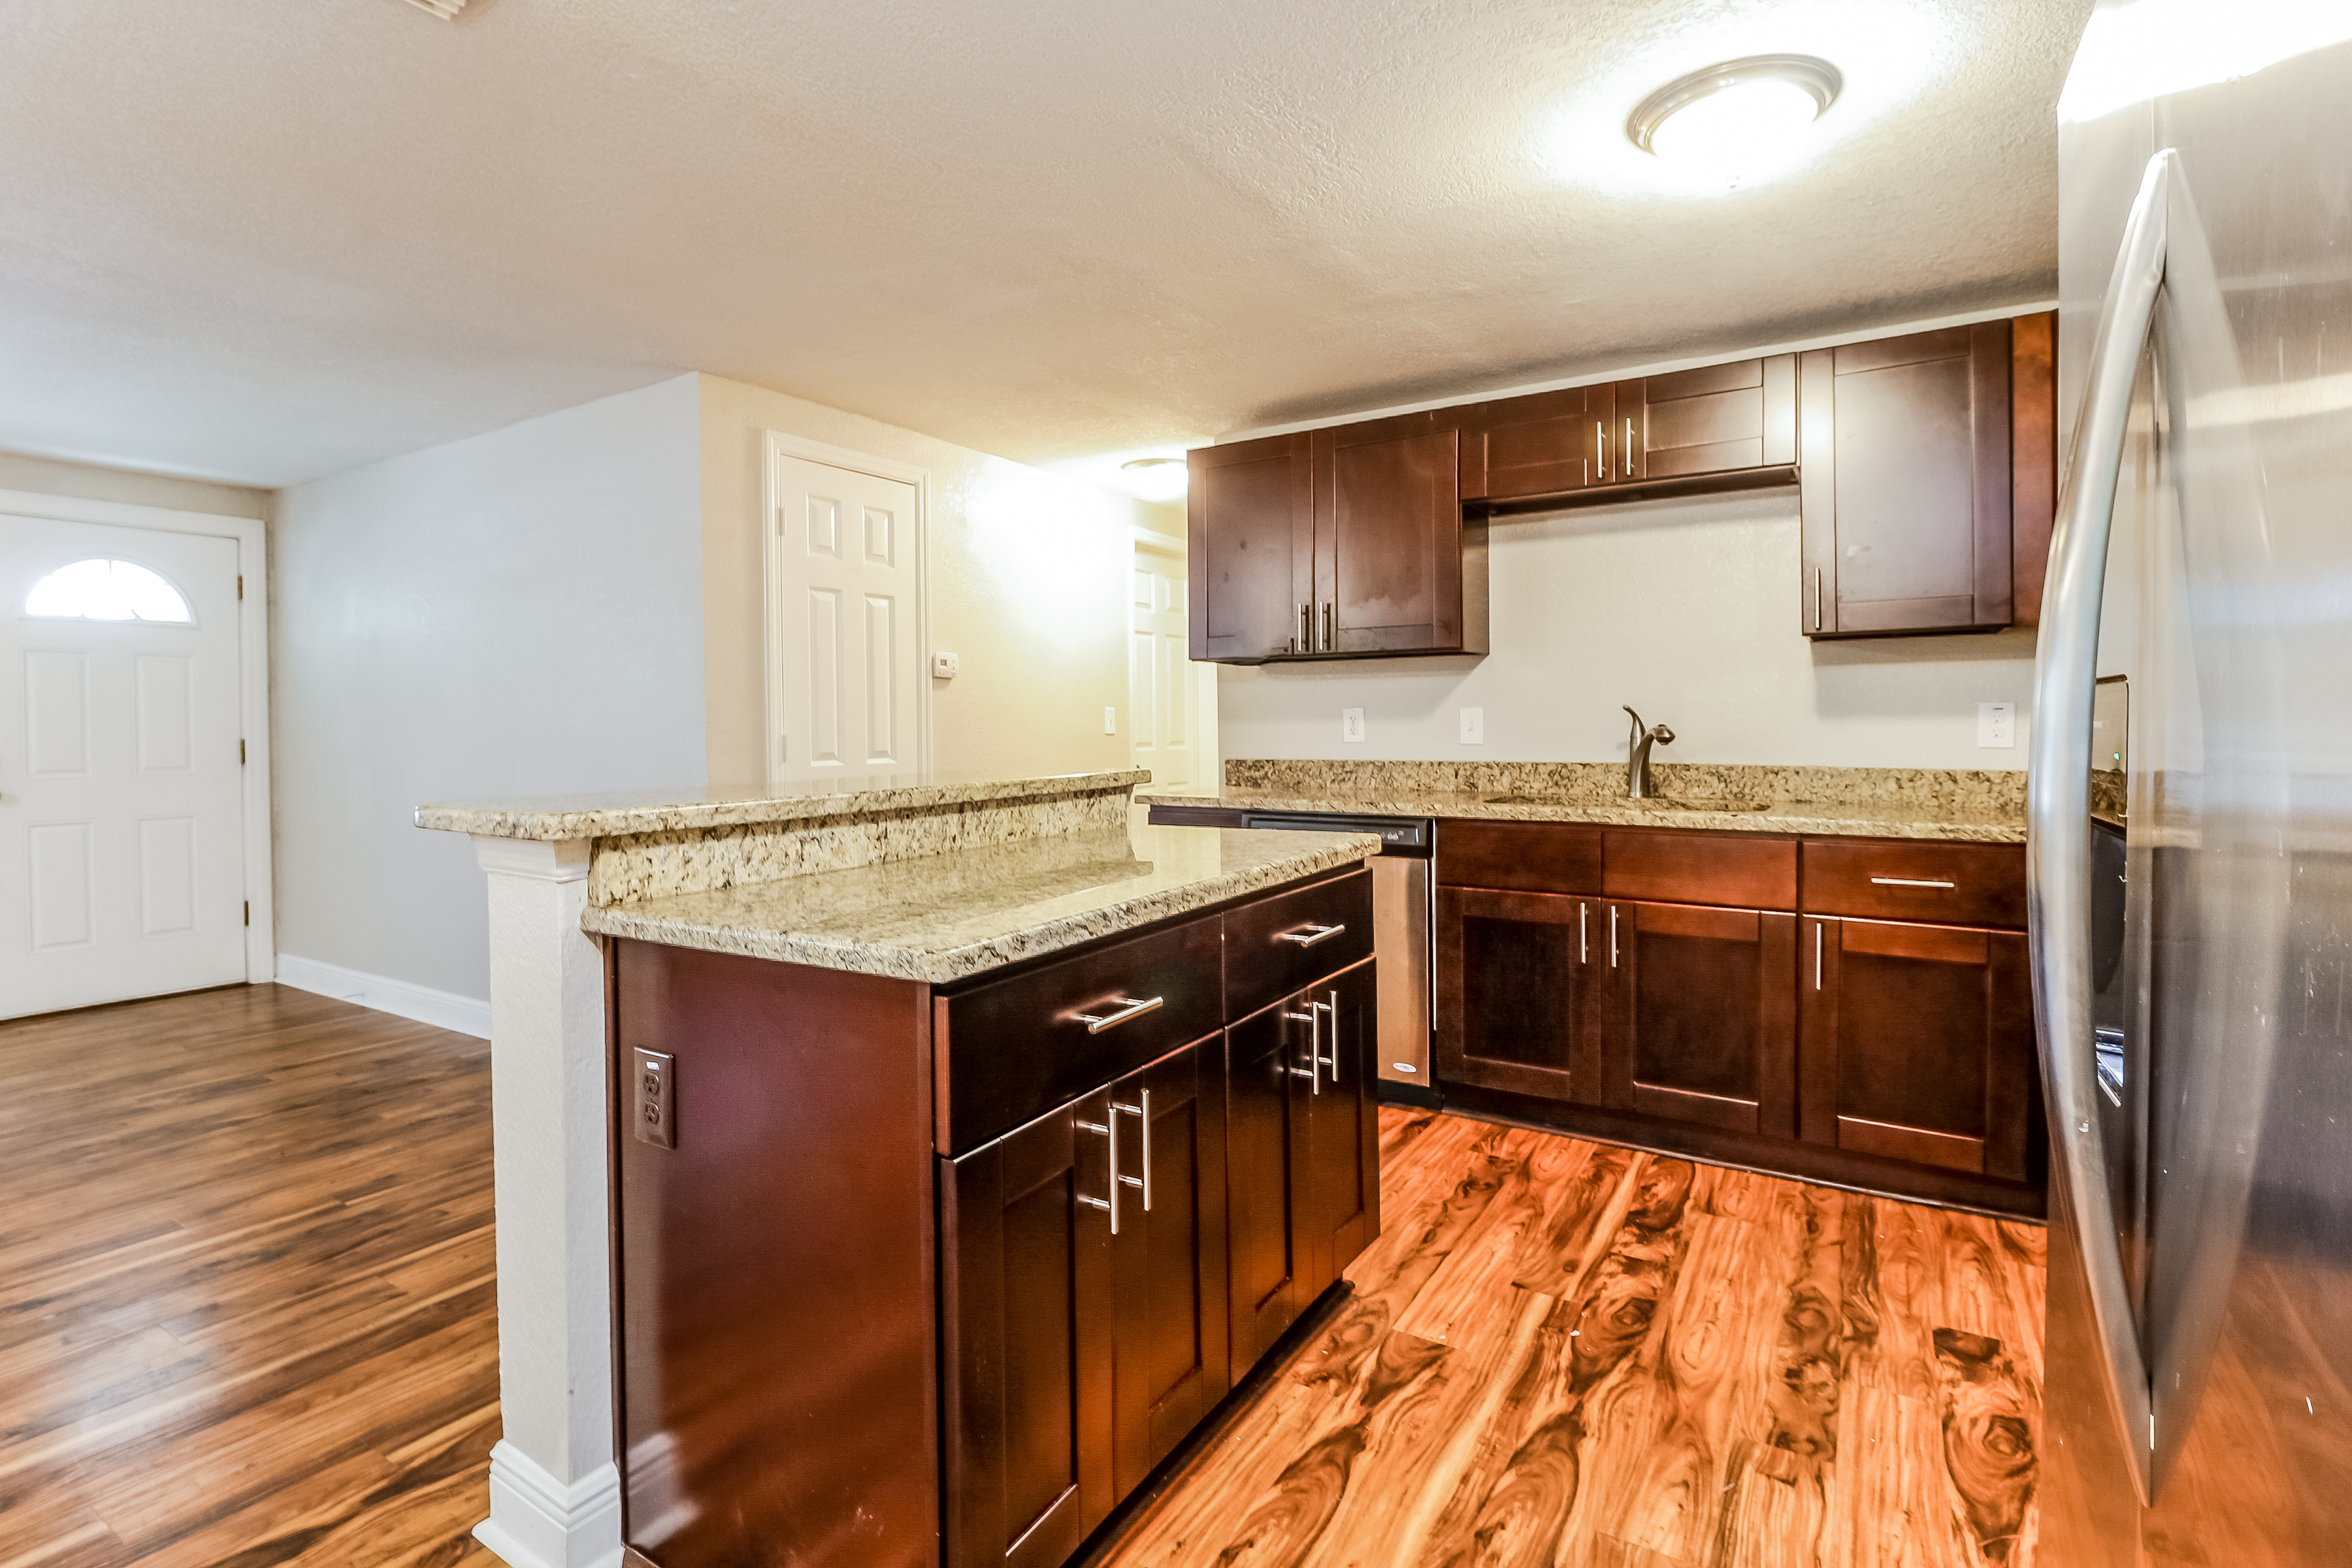 Photo of 10289 128th Terrace N, Largo, FL, 33773